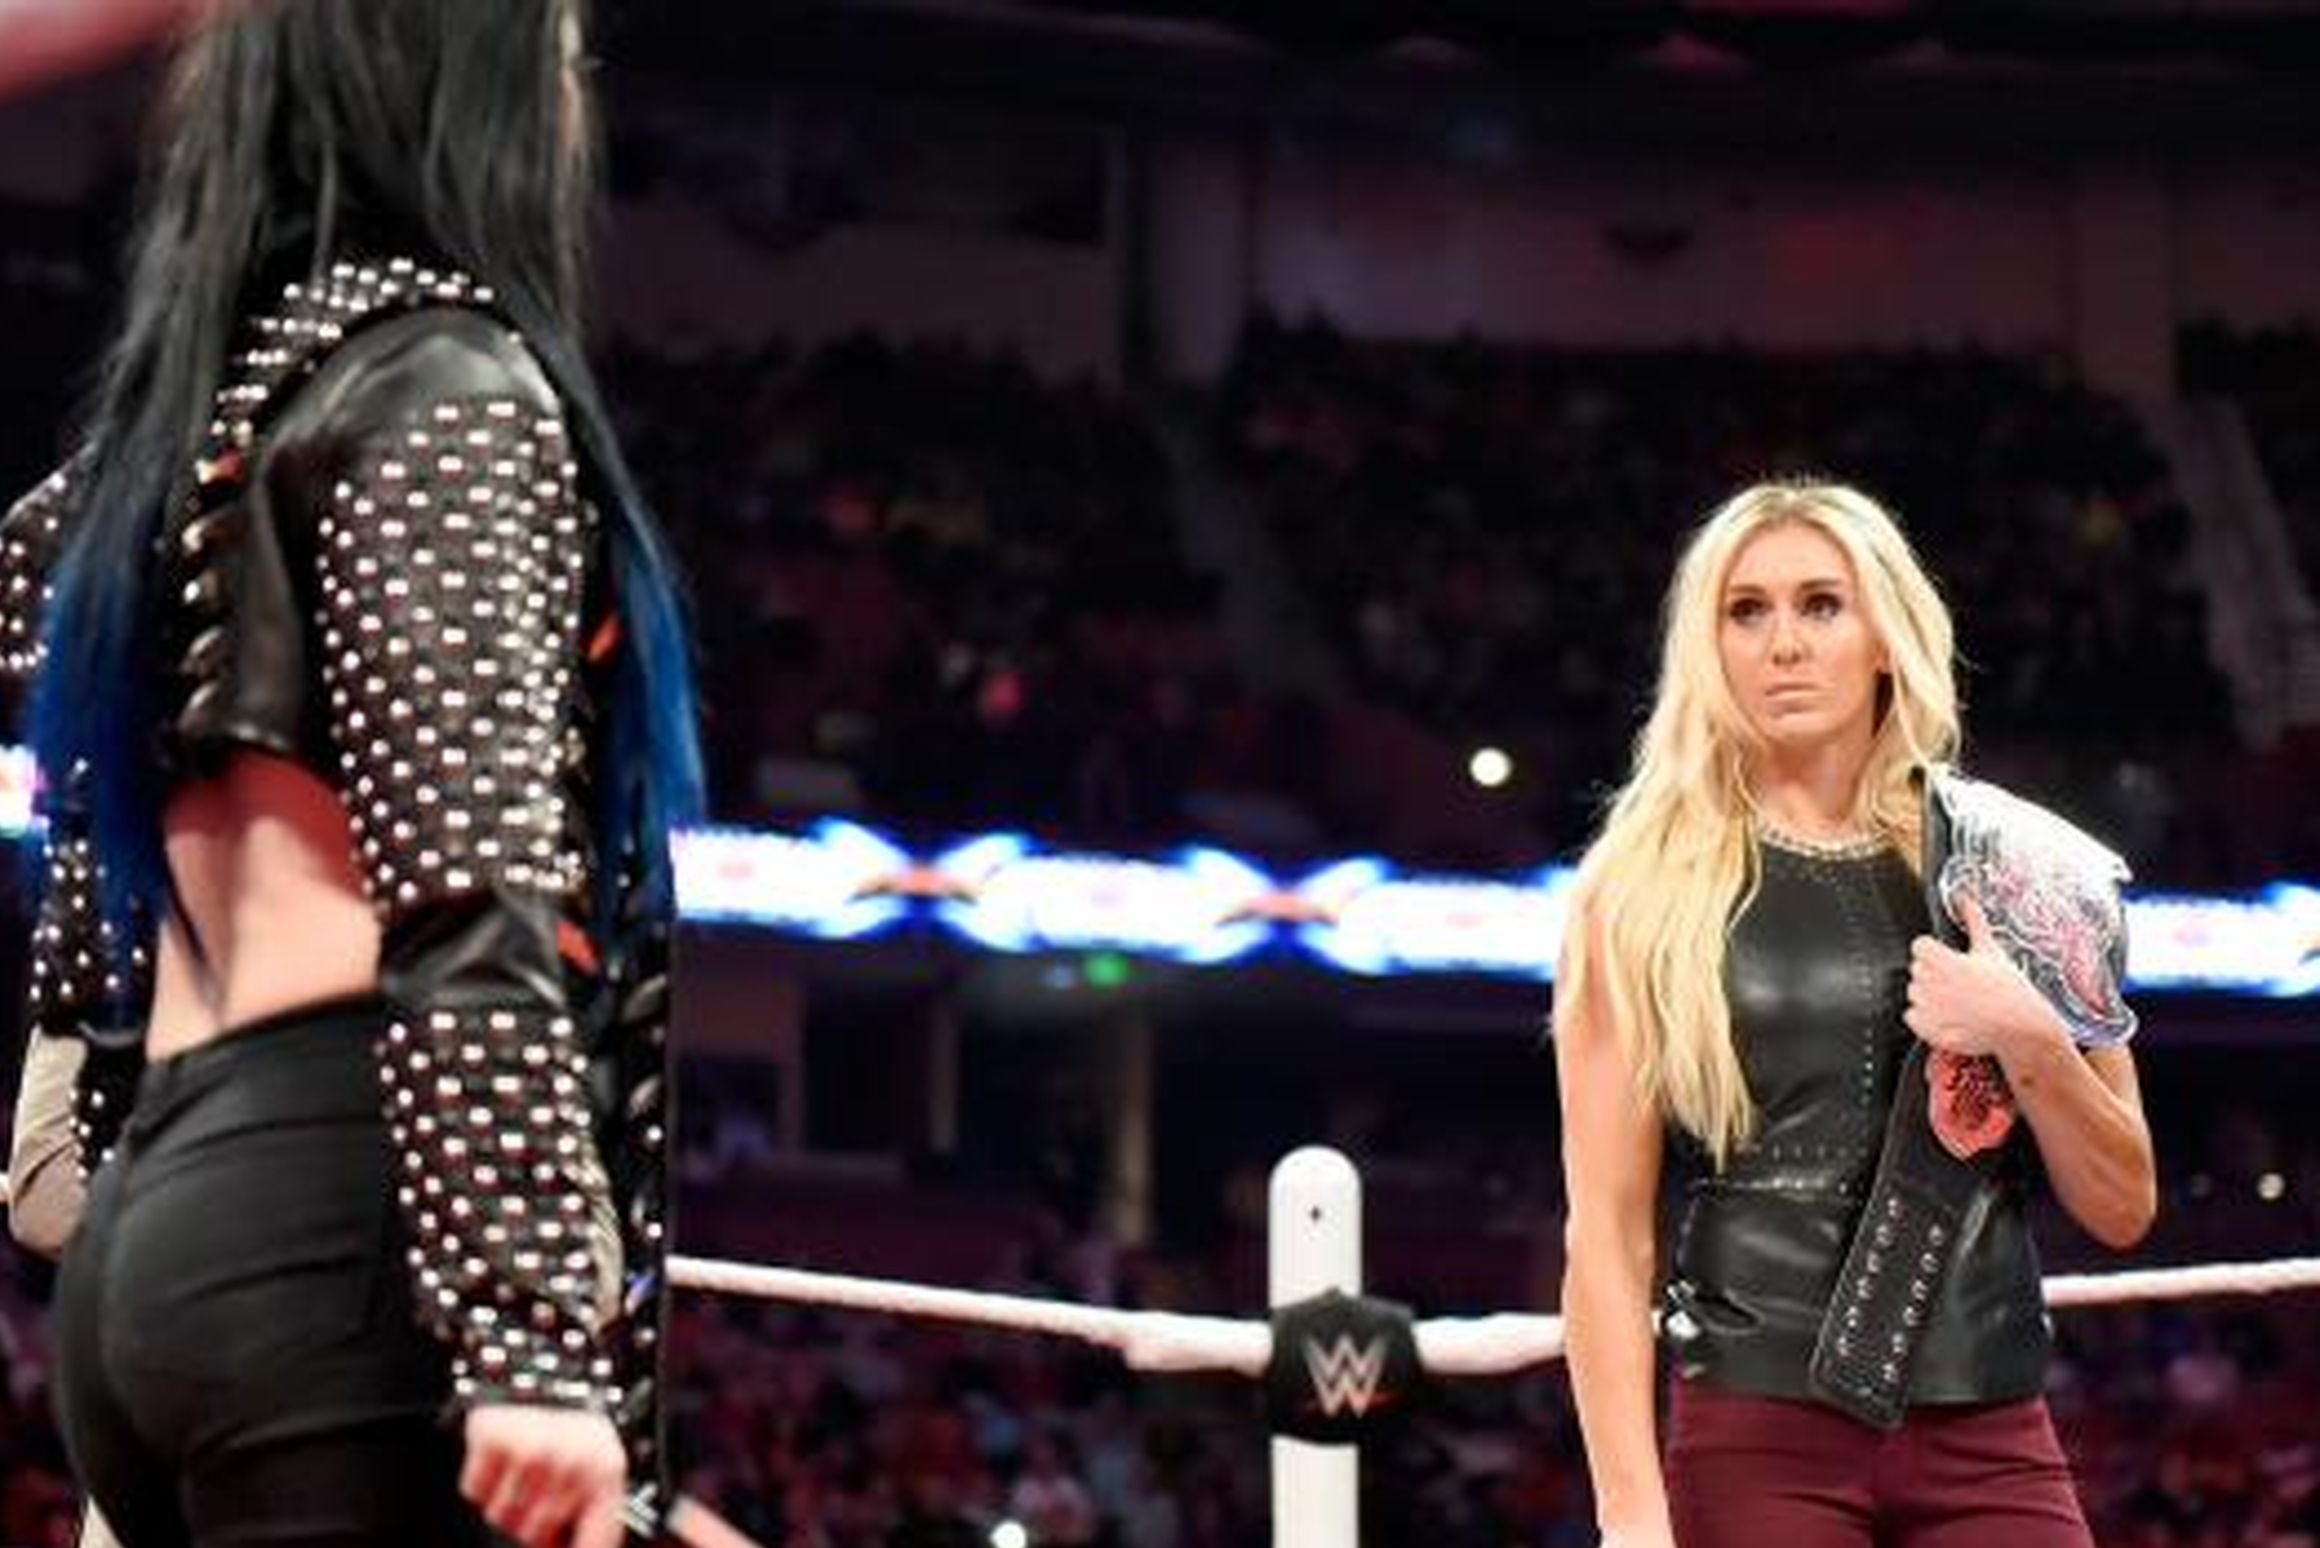 Paige vs. Charlotte